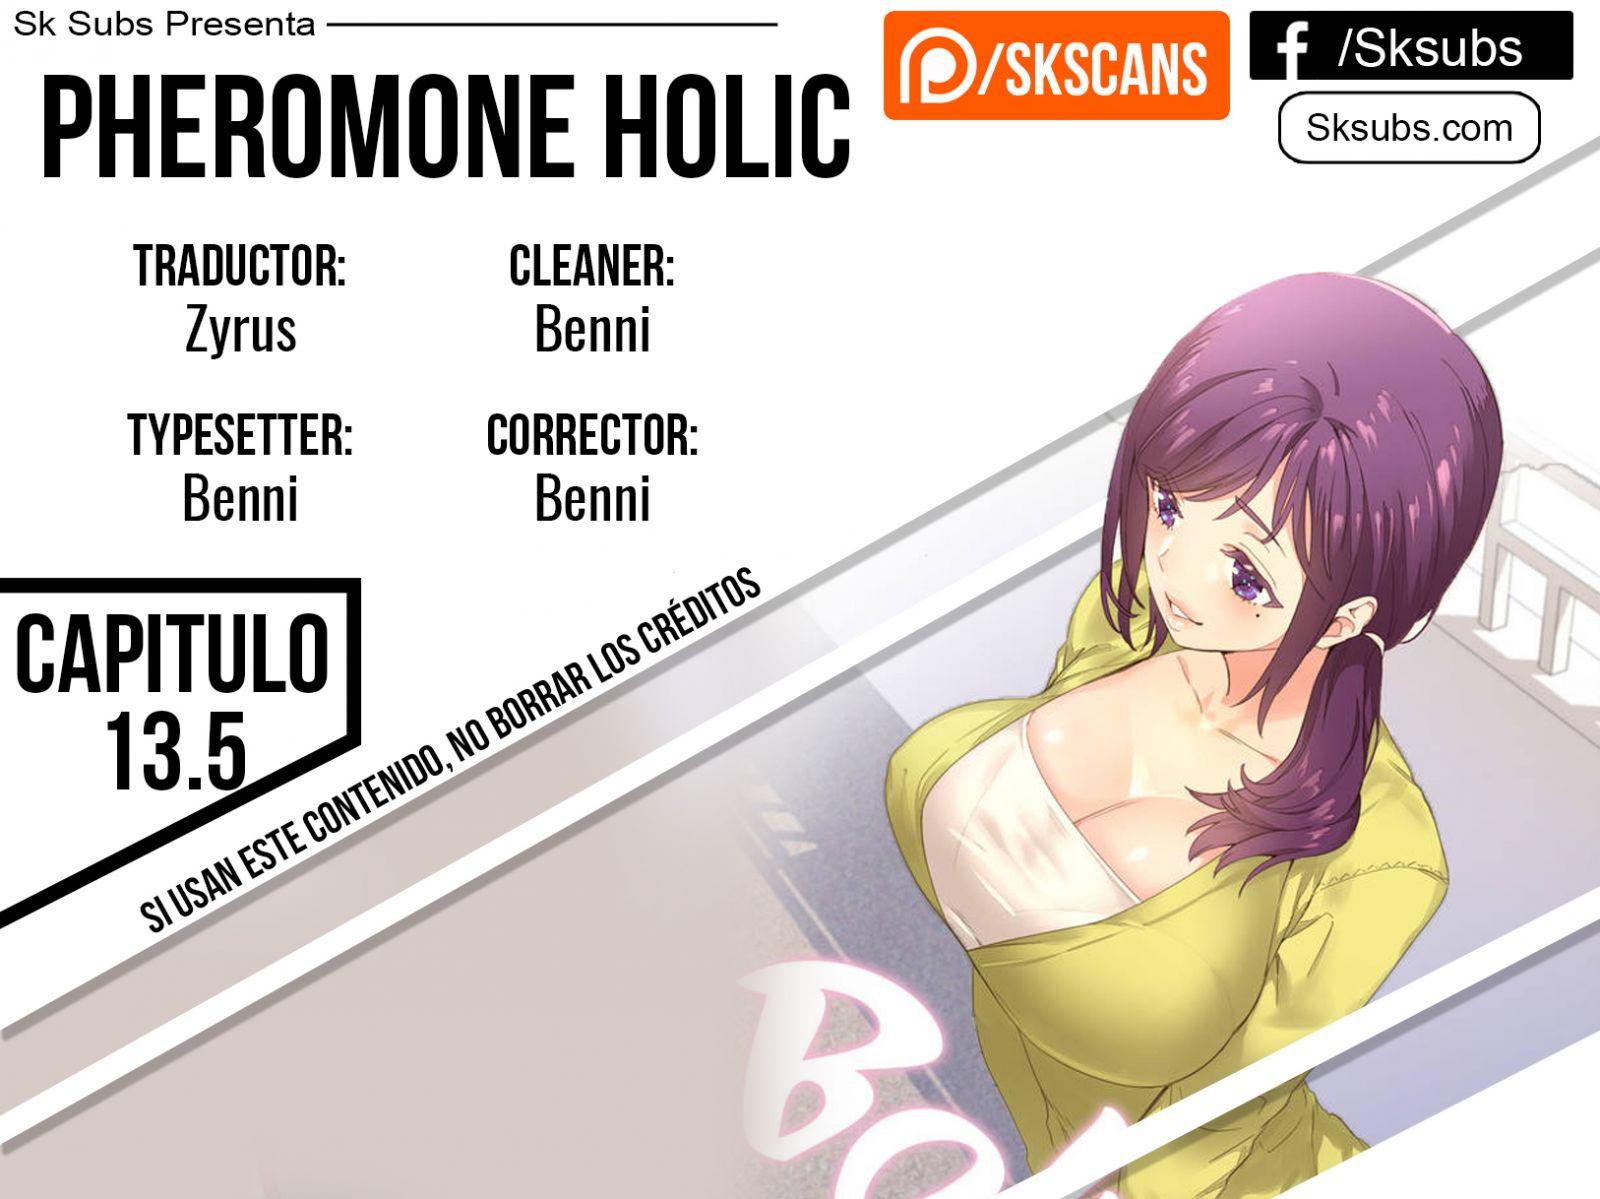 https://c9.mangatag.com/es_manga/pic5/58/25146/644930/a653016b1c2011a02edc520d91be94b9.jpg Page 1